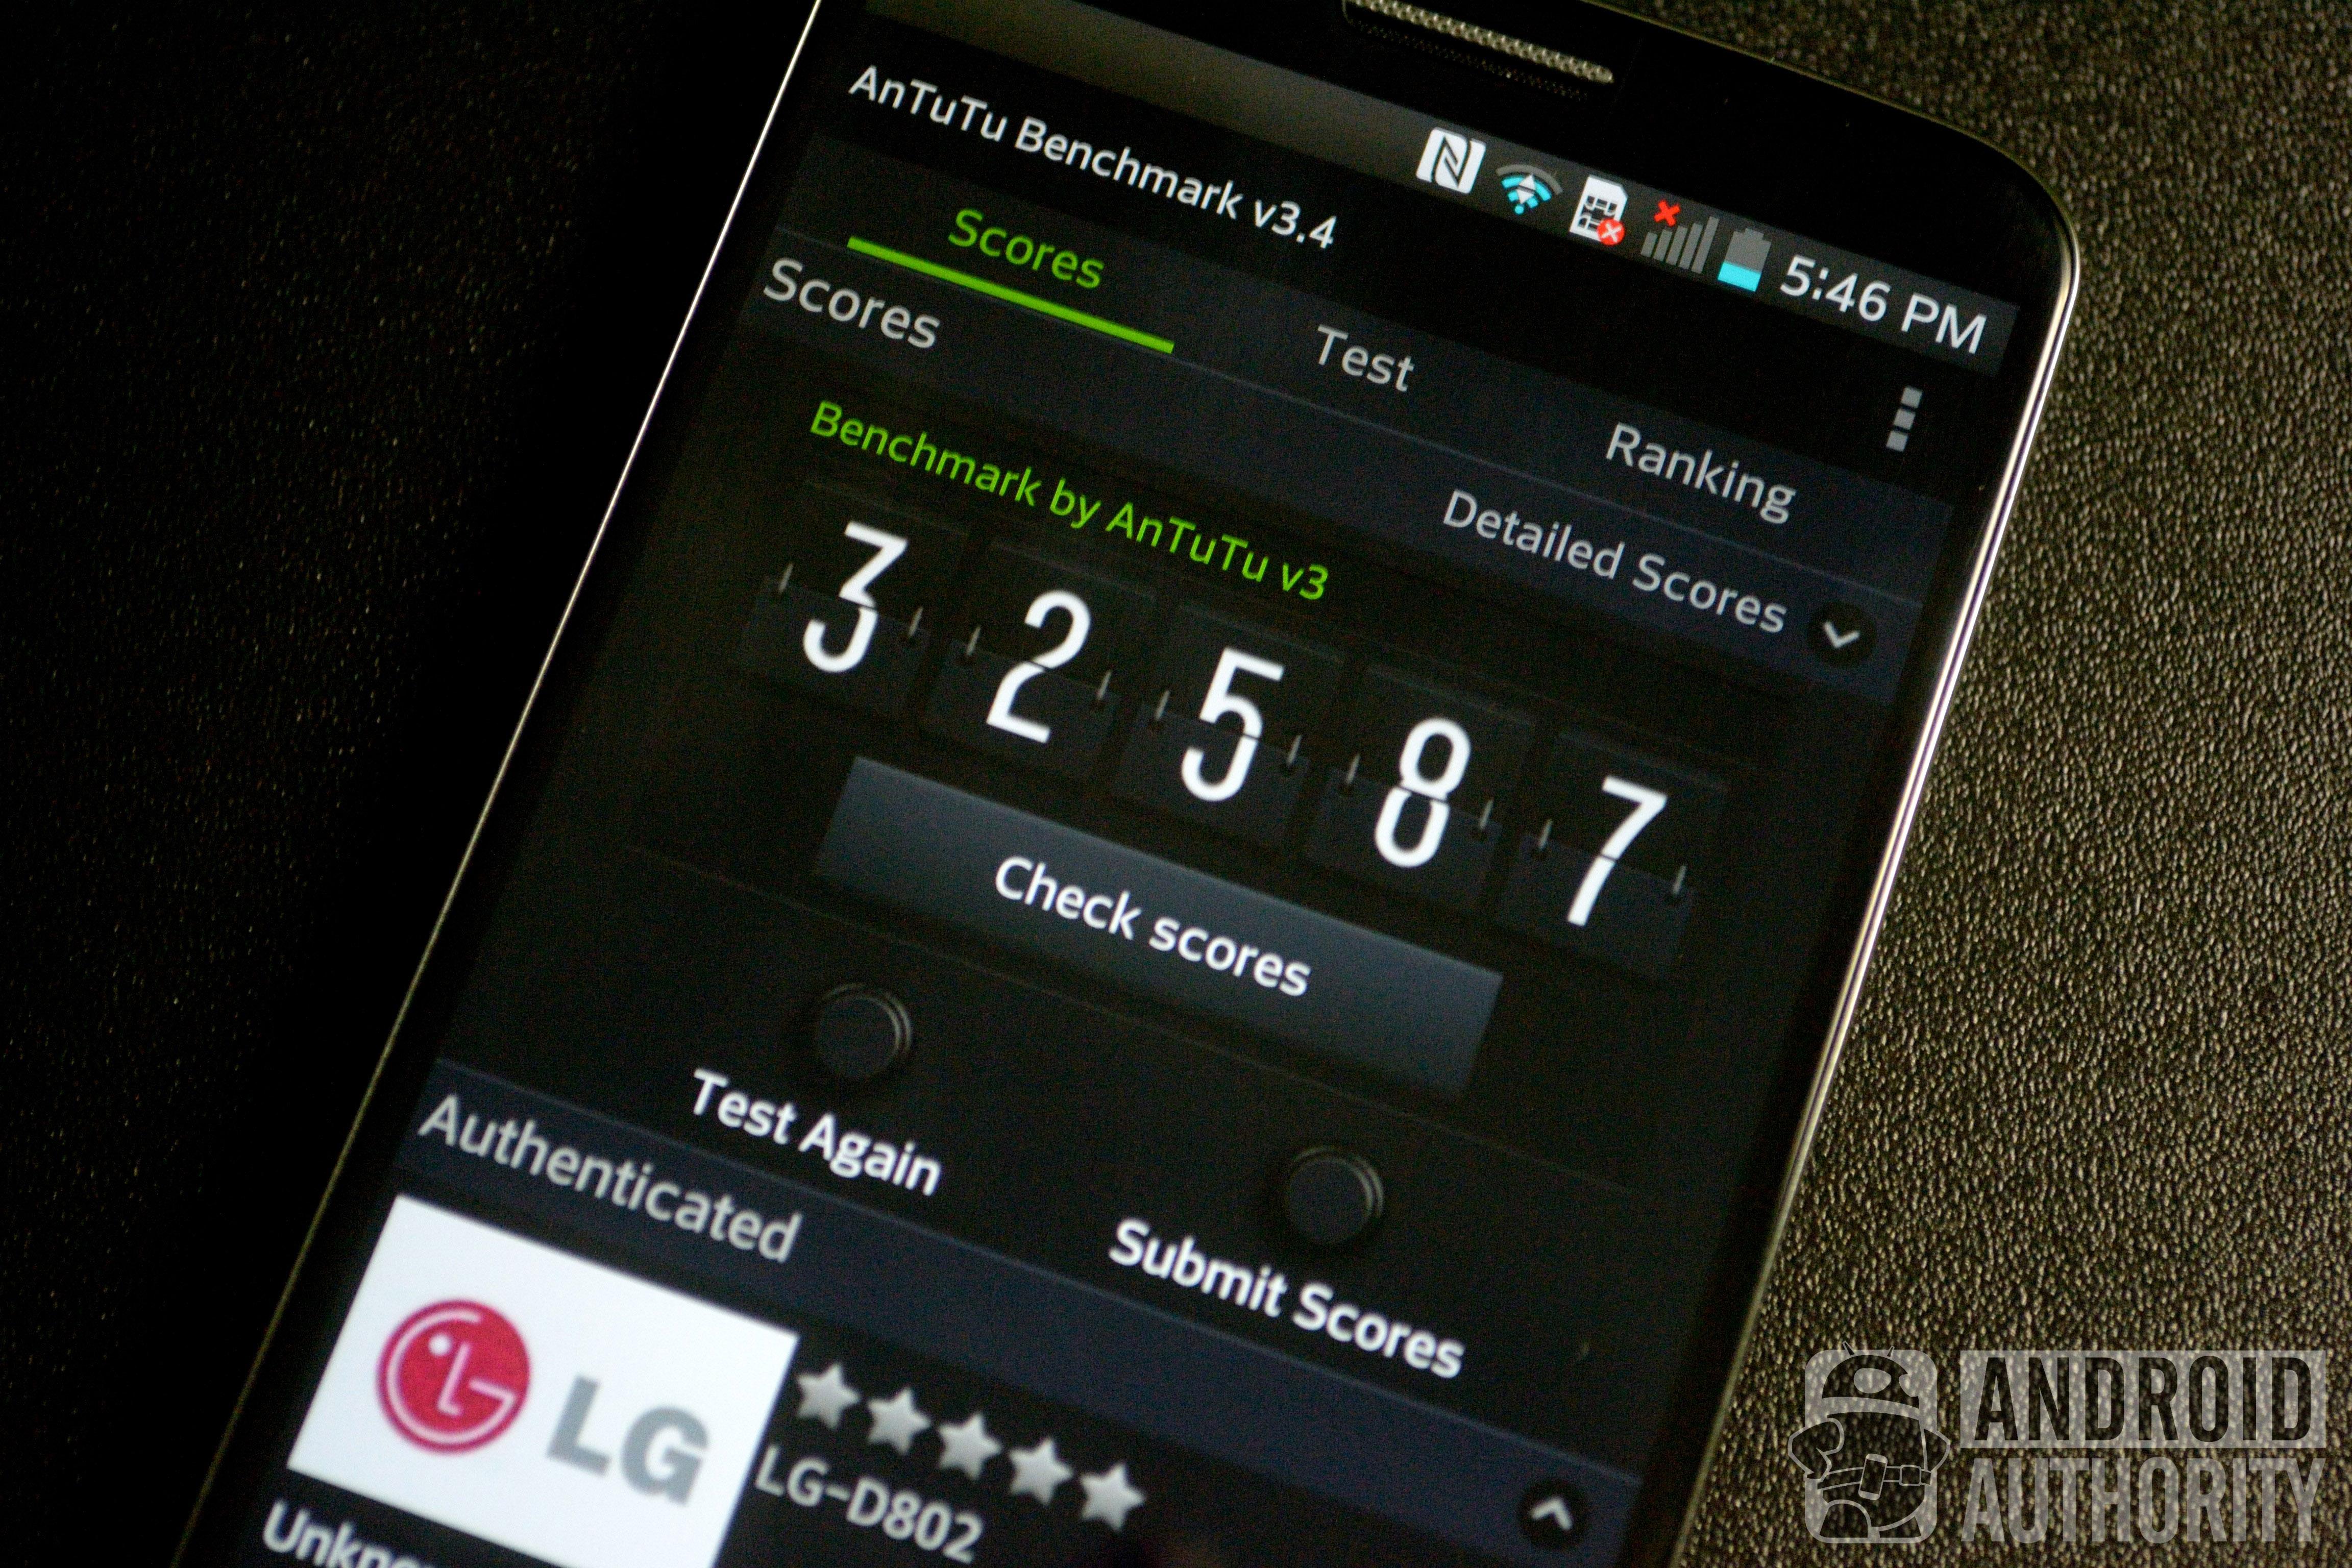 LG G2 Benchmarks